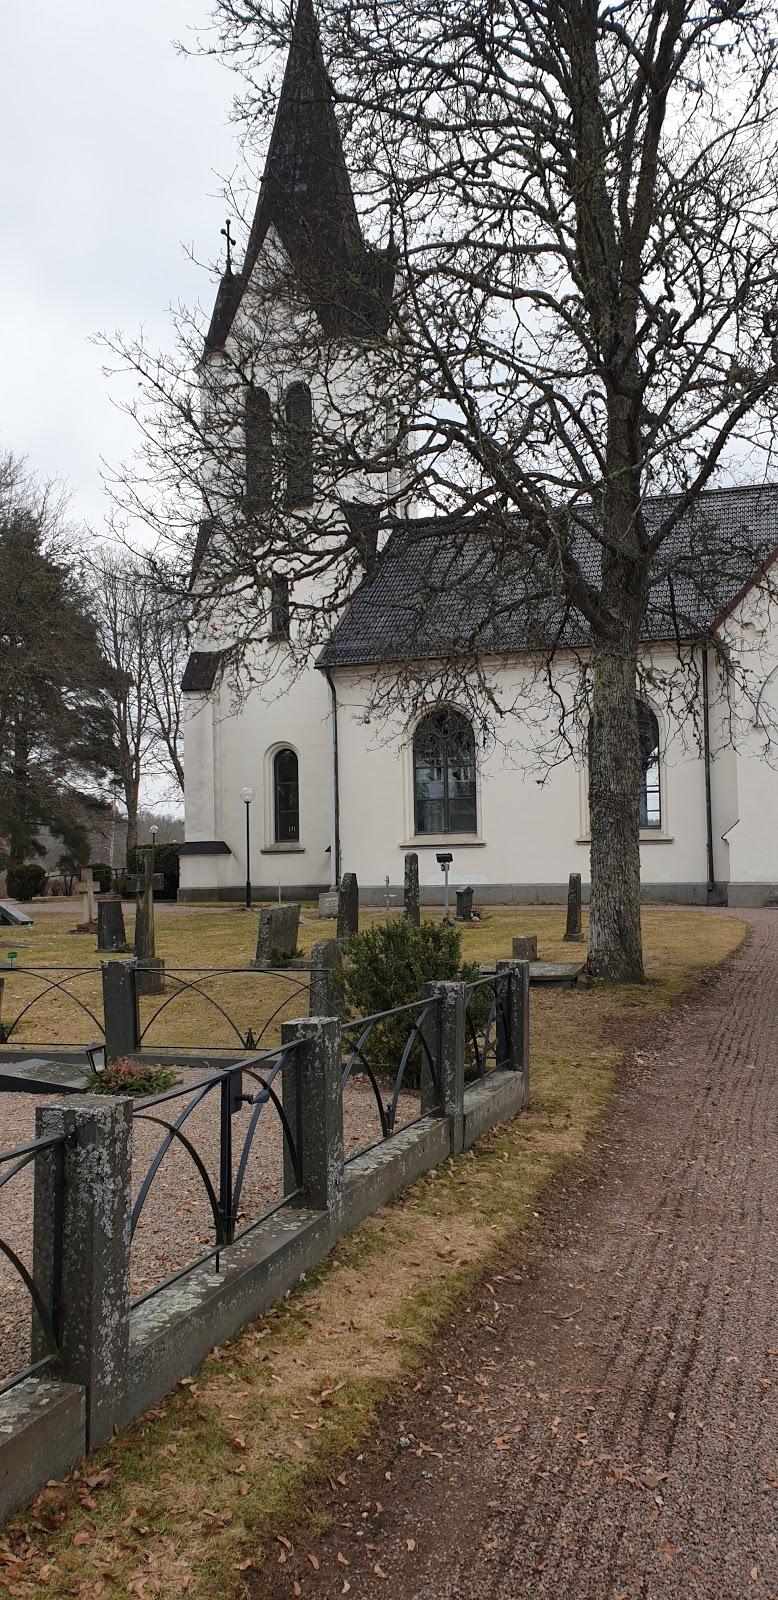 Fagerhults kyrka